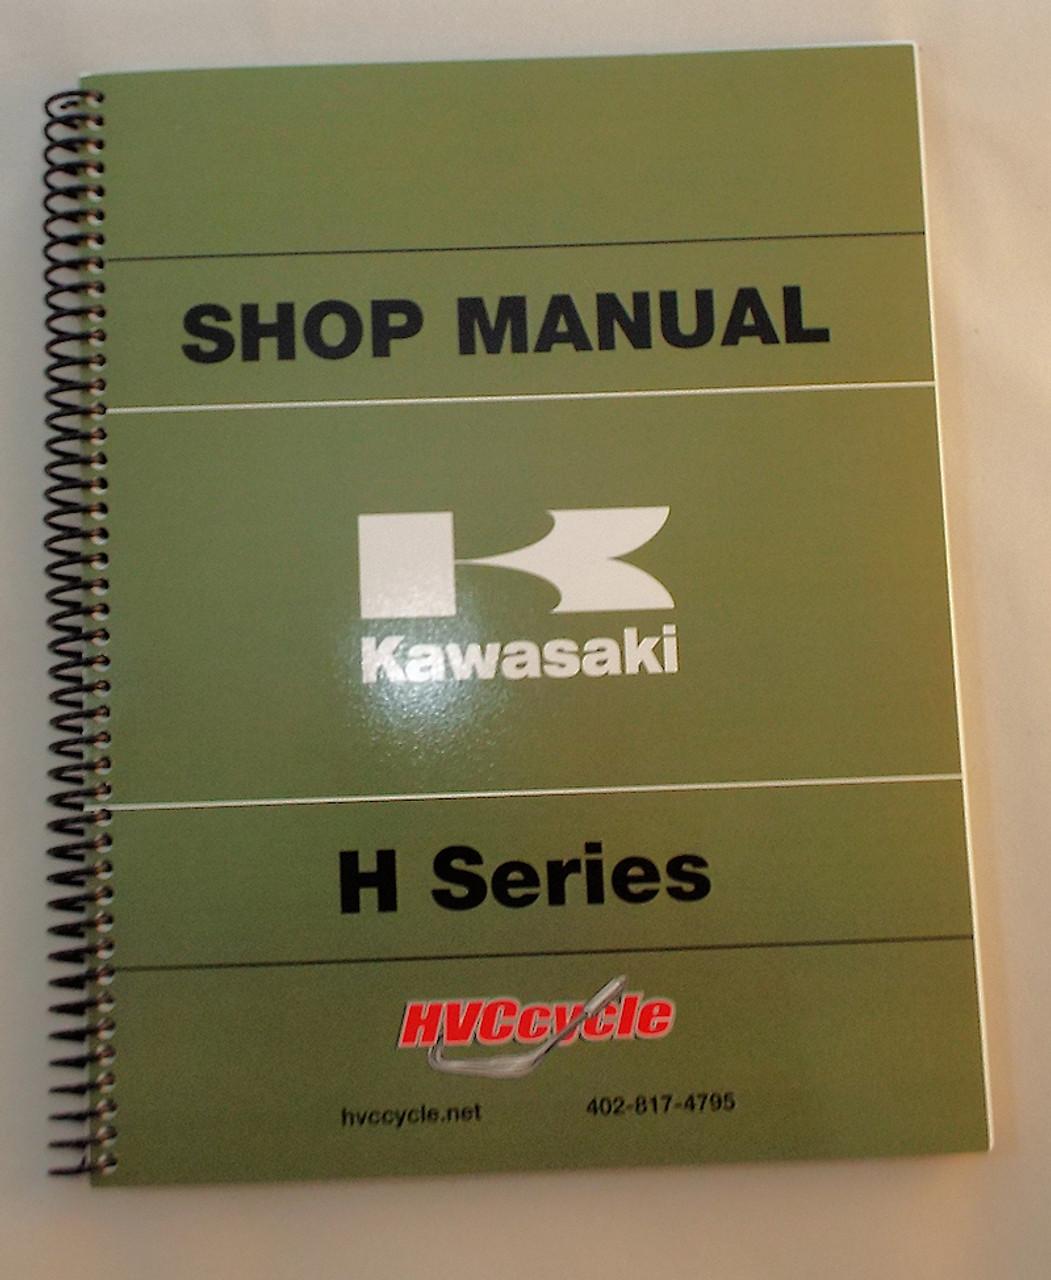 small resolution of kawasaki wiring diagram for 1969 1972 h1 triple